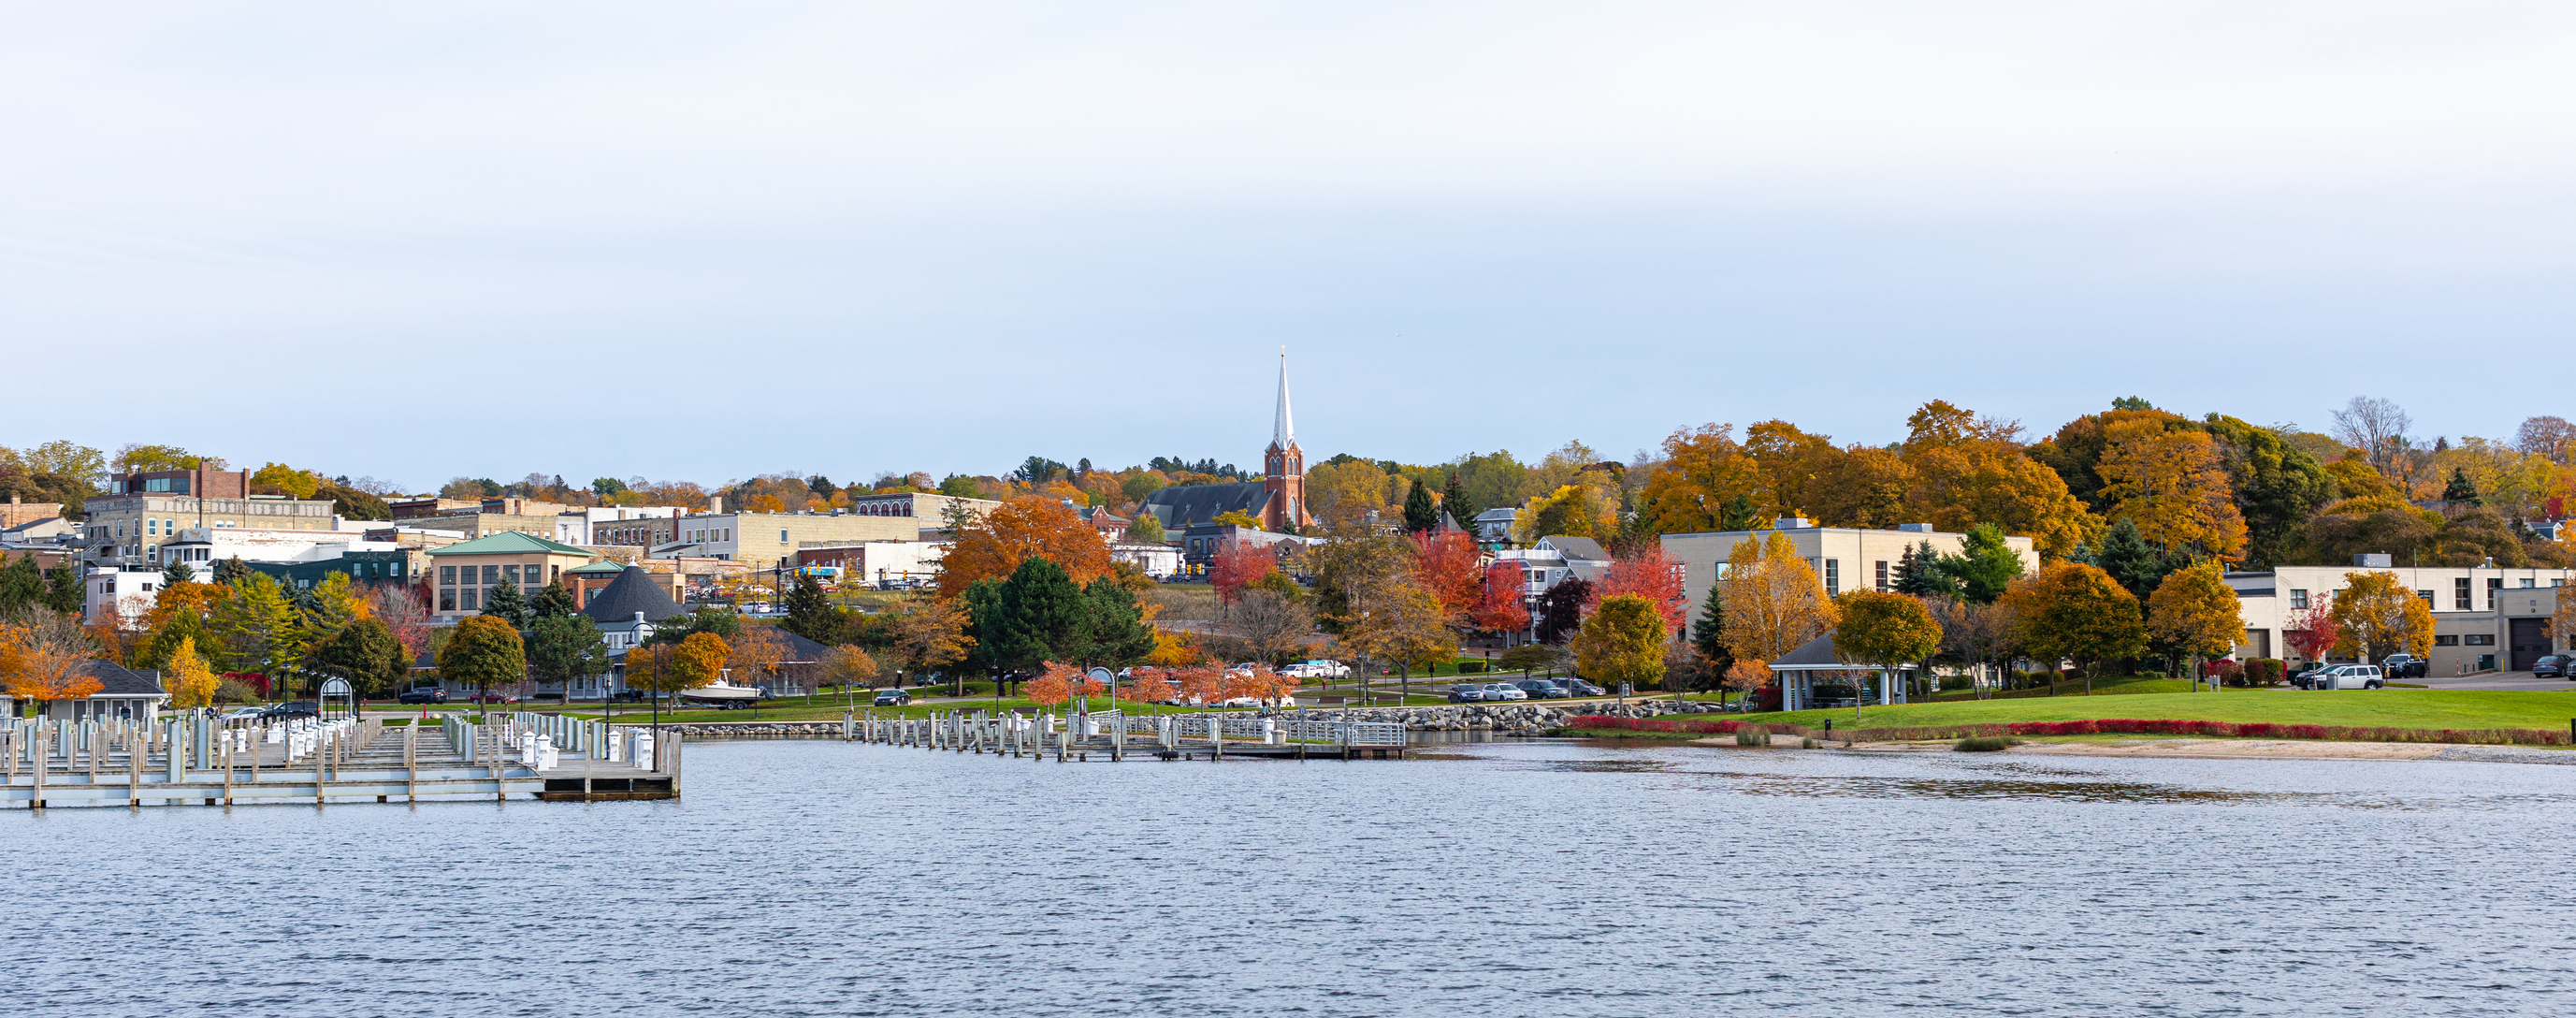 A quaint city on teh shores of a lake.